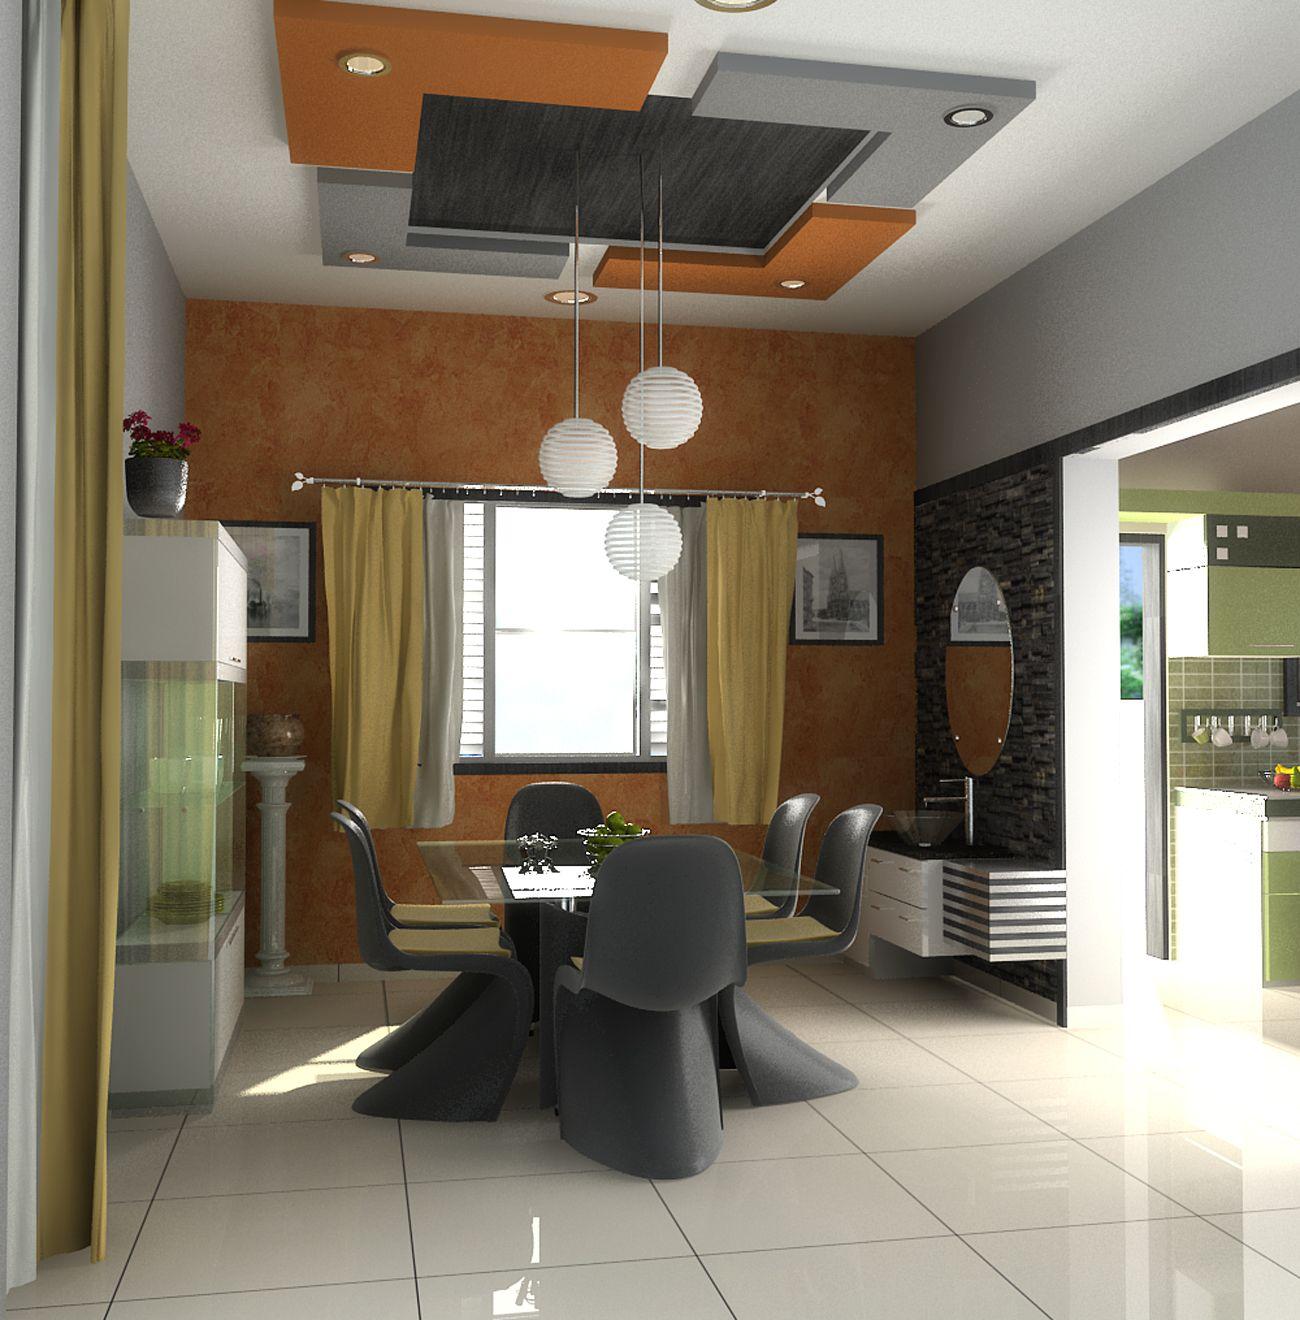 Pin by Zaw on gypsum board ceilings | Interior design ...